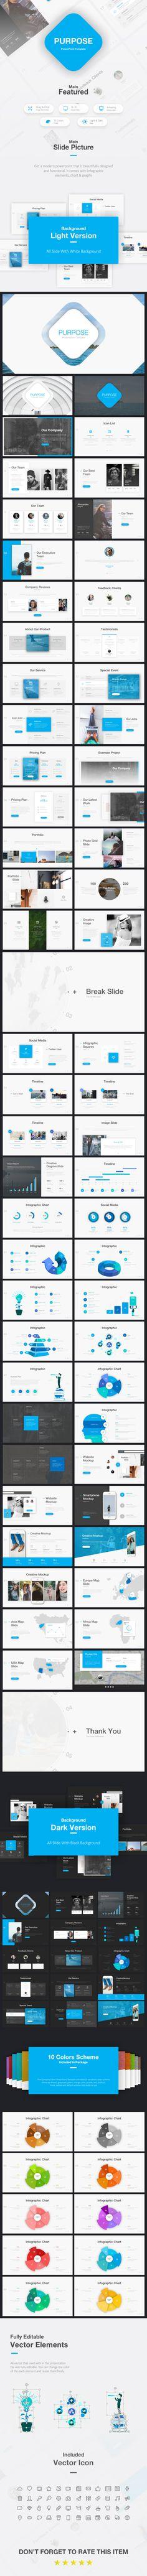 Purpose Presentation Template #powerpoint #presentation Download https://graphicriver.net/item/purpose-presentation-template/19471523?s_rank=1?ref=BrandEarth